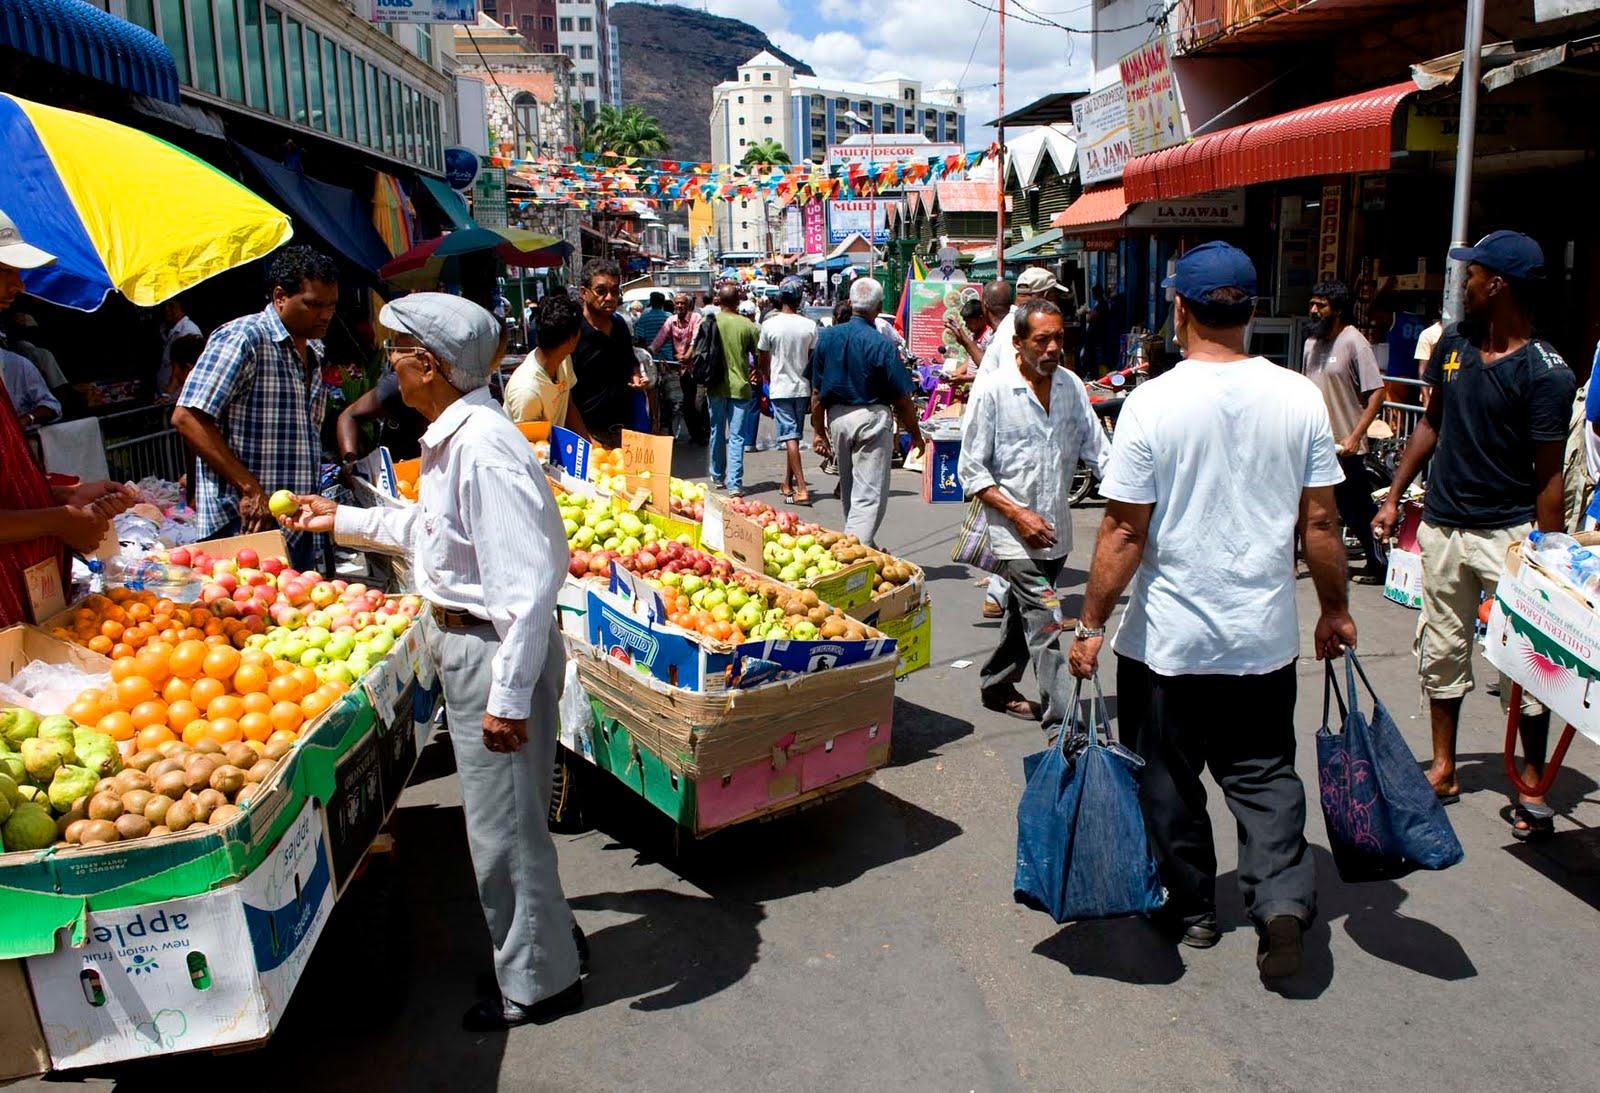 - Mauritius market port louis ...